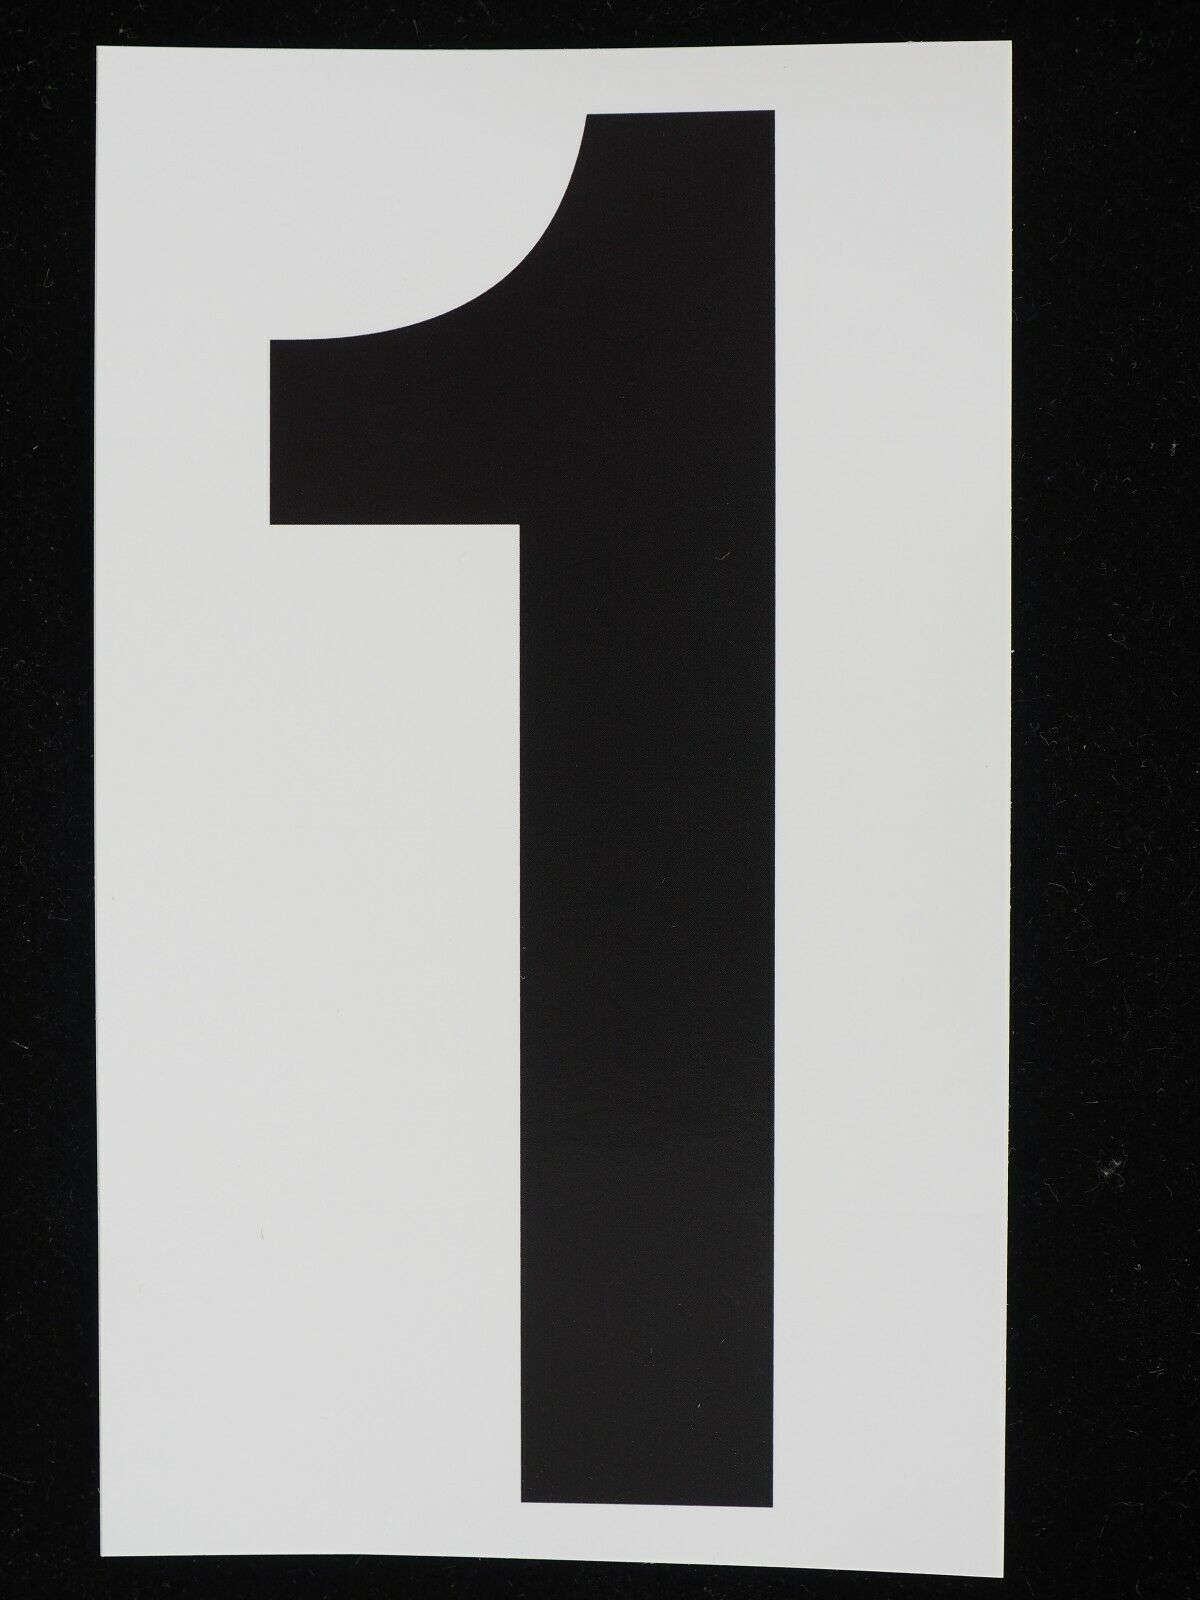 "Home Decoration - 5"" U-PICK 0-9 Stickers Vinyl Adhesive Address Numbers Black & White MADE USA"